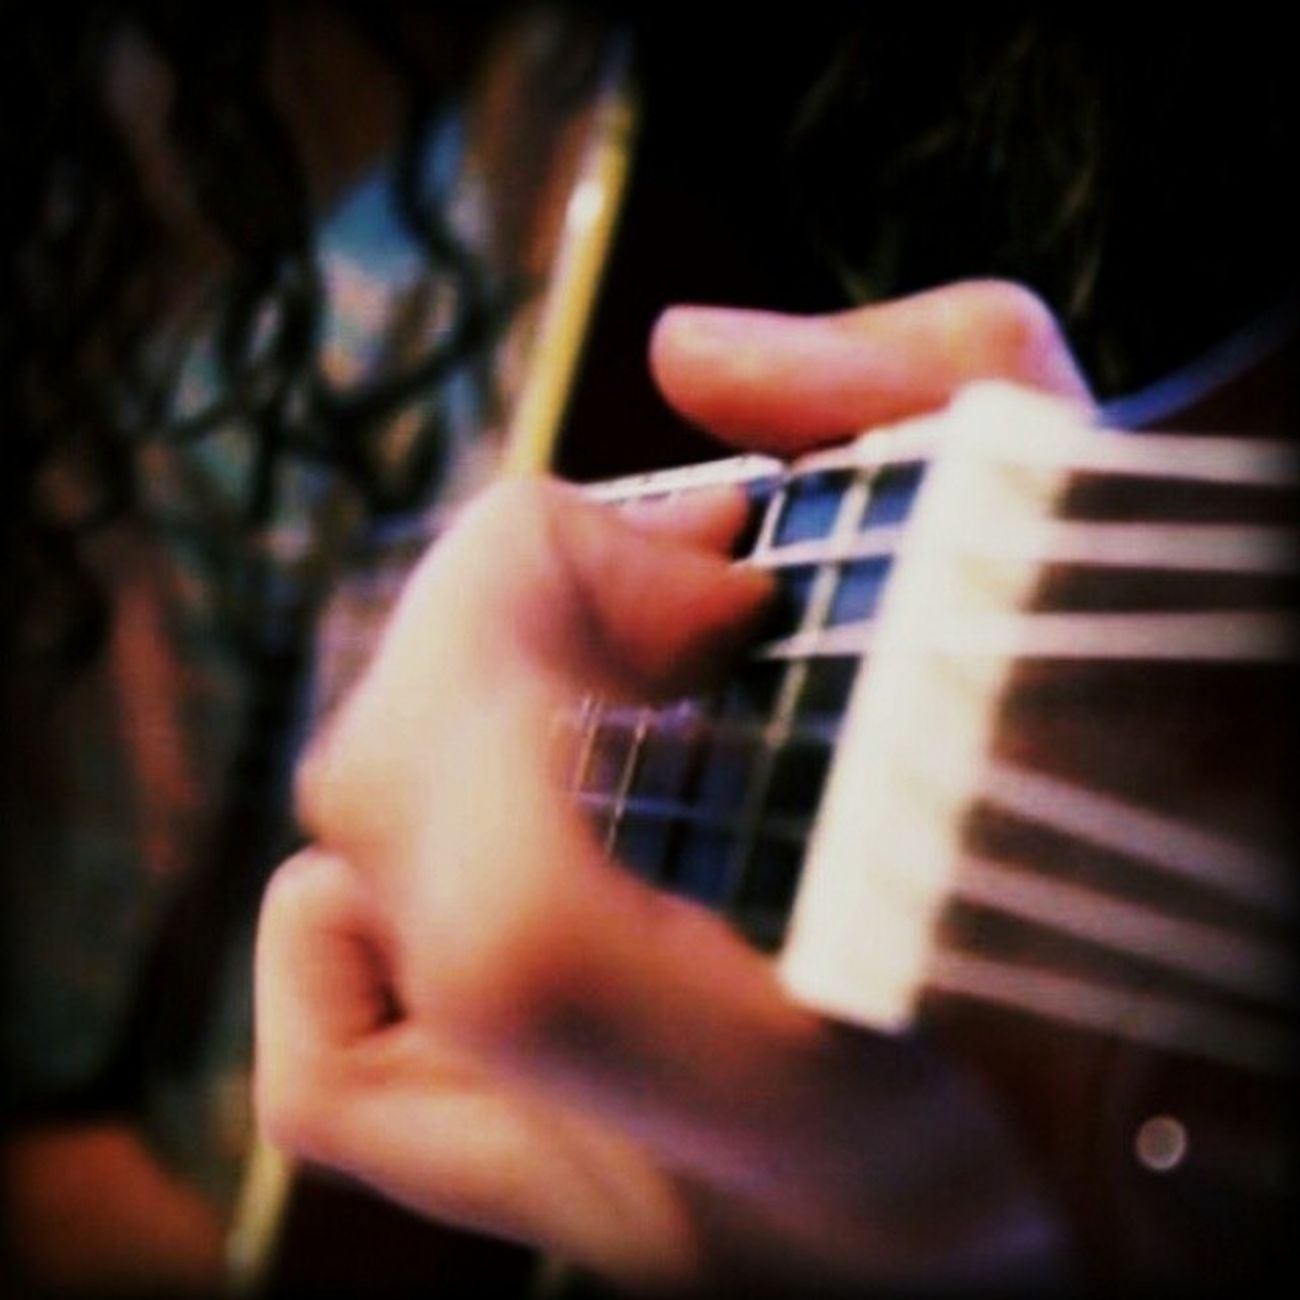 SpainGuitar Guitarra Music Loyal_group1 sumaysiguenos ig_alicante ig_europe ig_spain igs_photos ig_merida igers igworldclub guadalajaraSpain gf_spain gf_daily gf_family love play